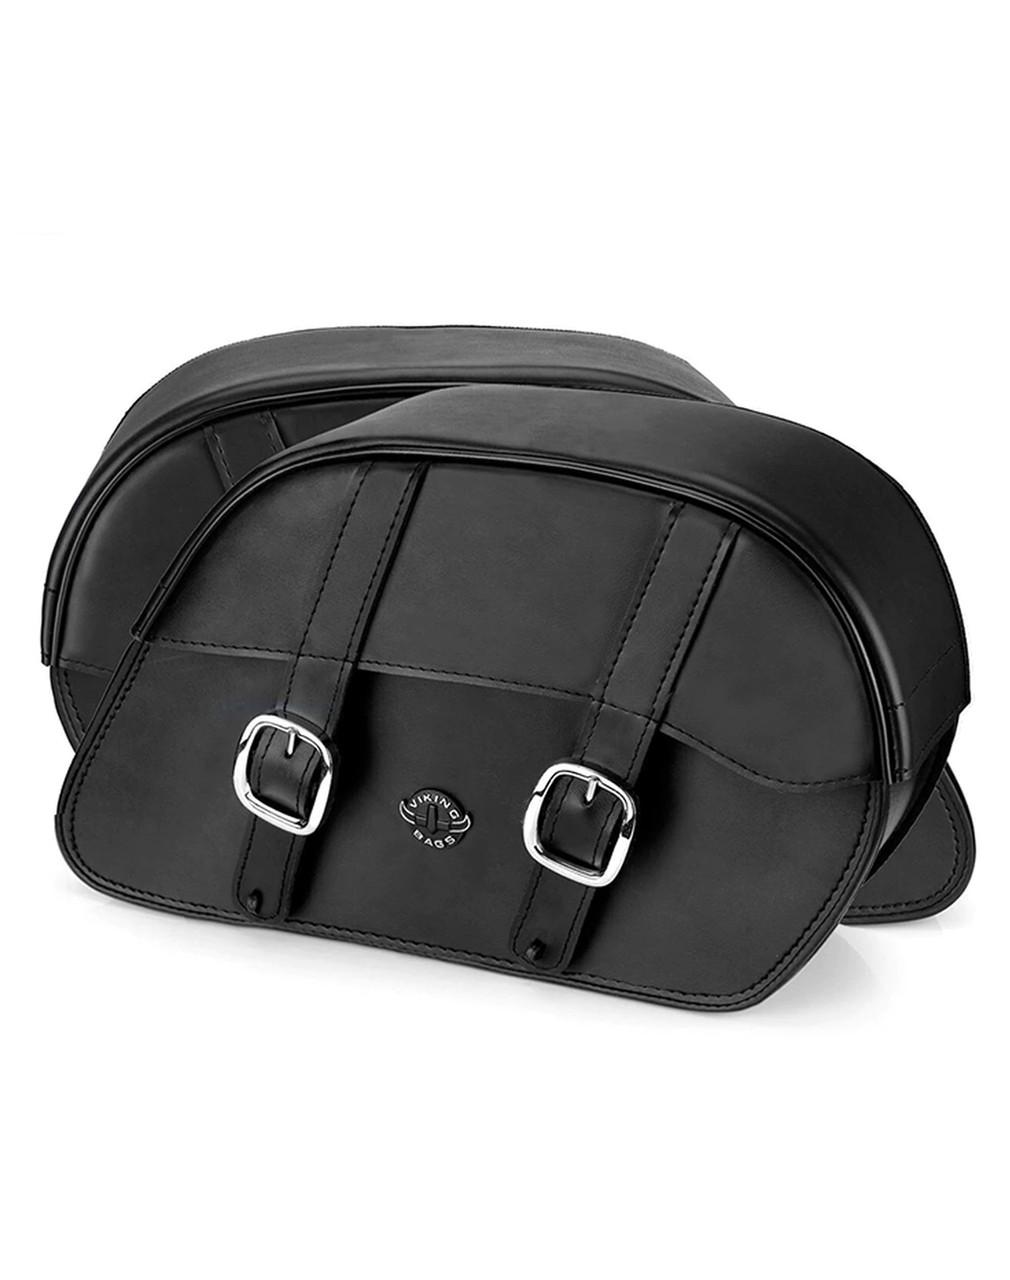 Honda VTX 1800 C Slanted Large Motorcycle Saddlebags Both Bags View